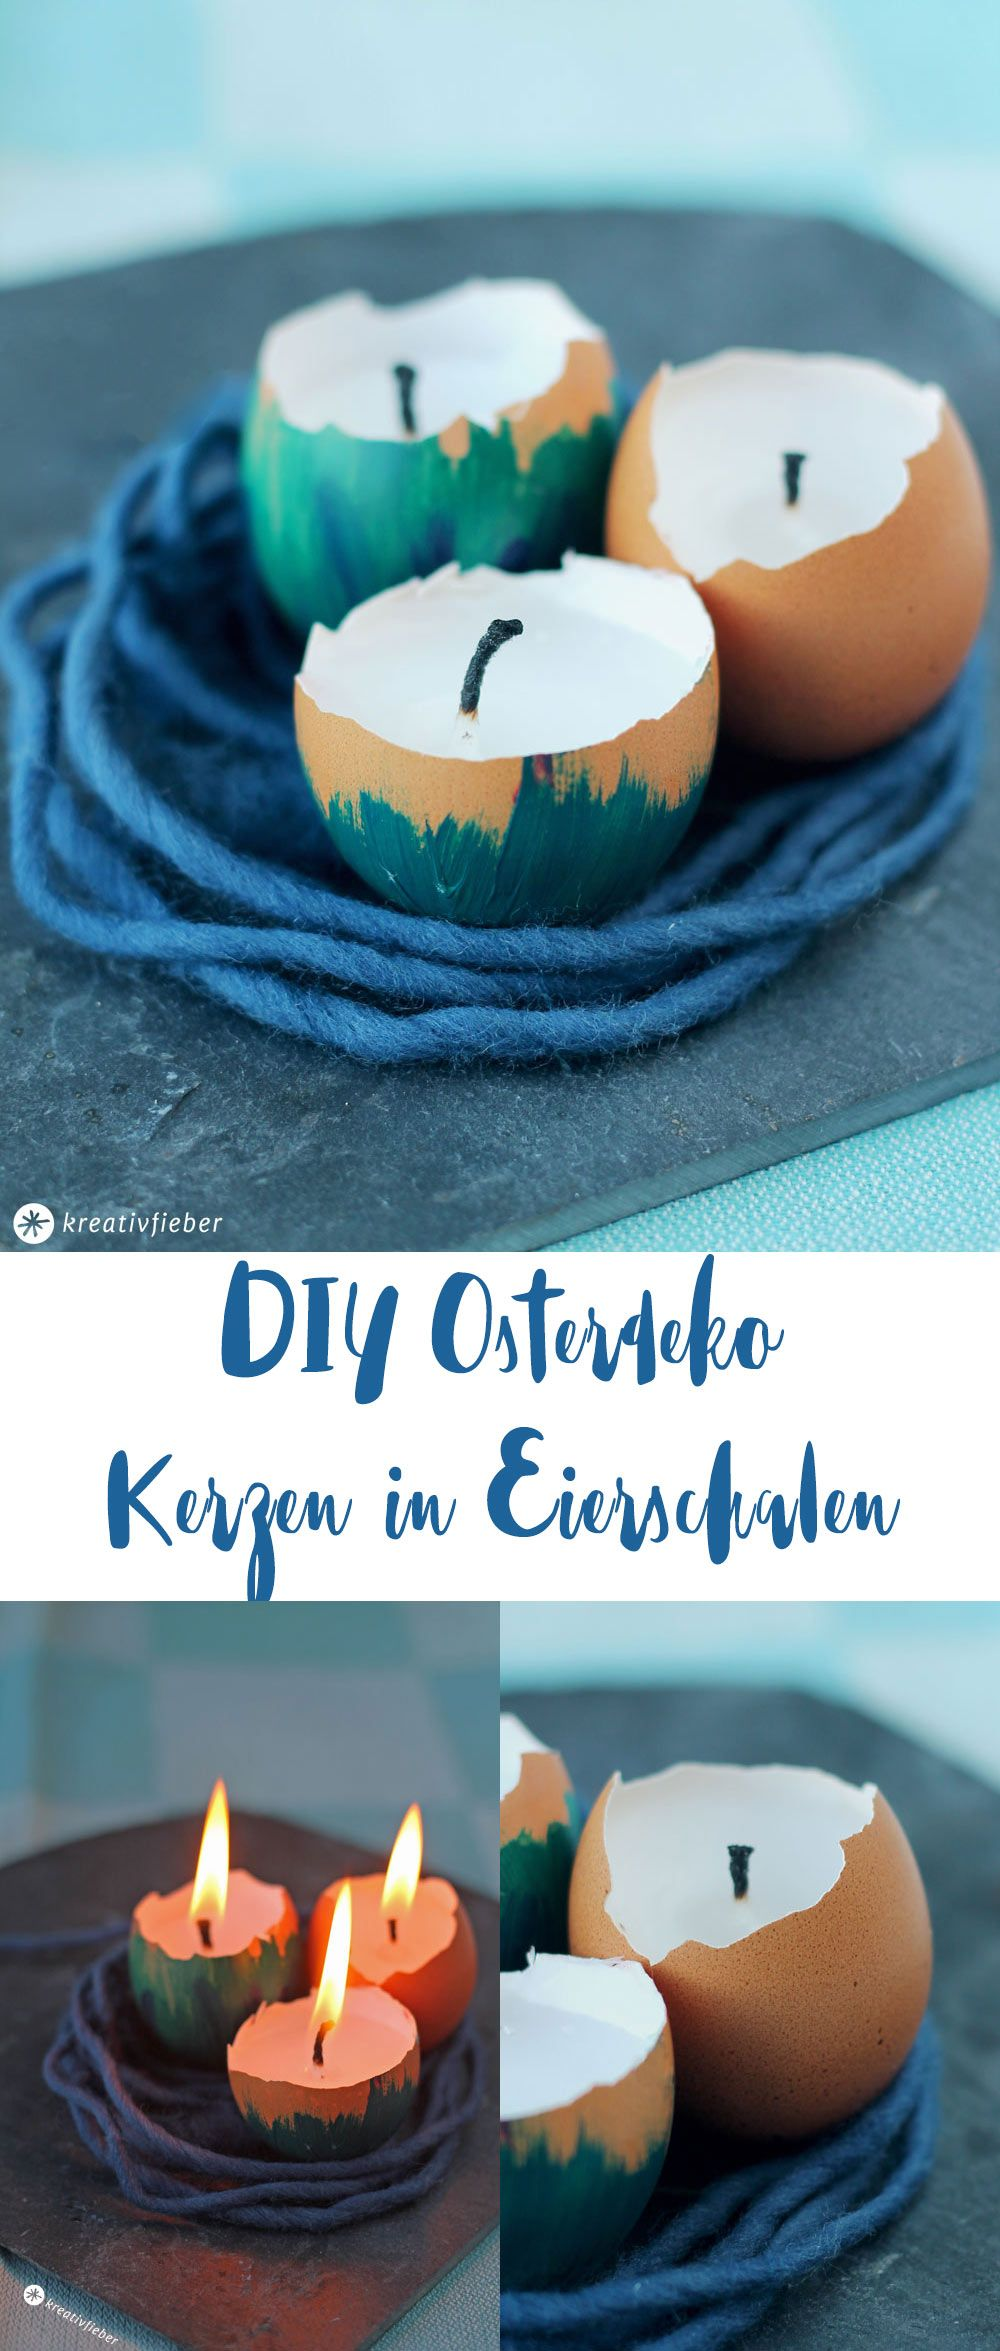 Kerzen in Eierschalen - Osterdeko DIY